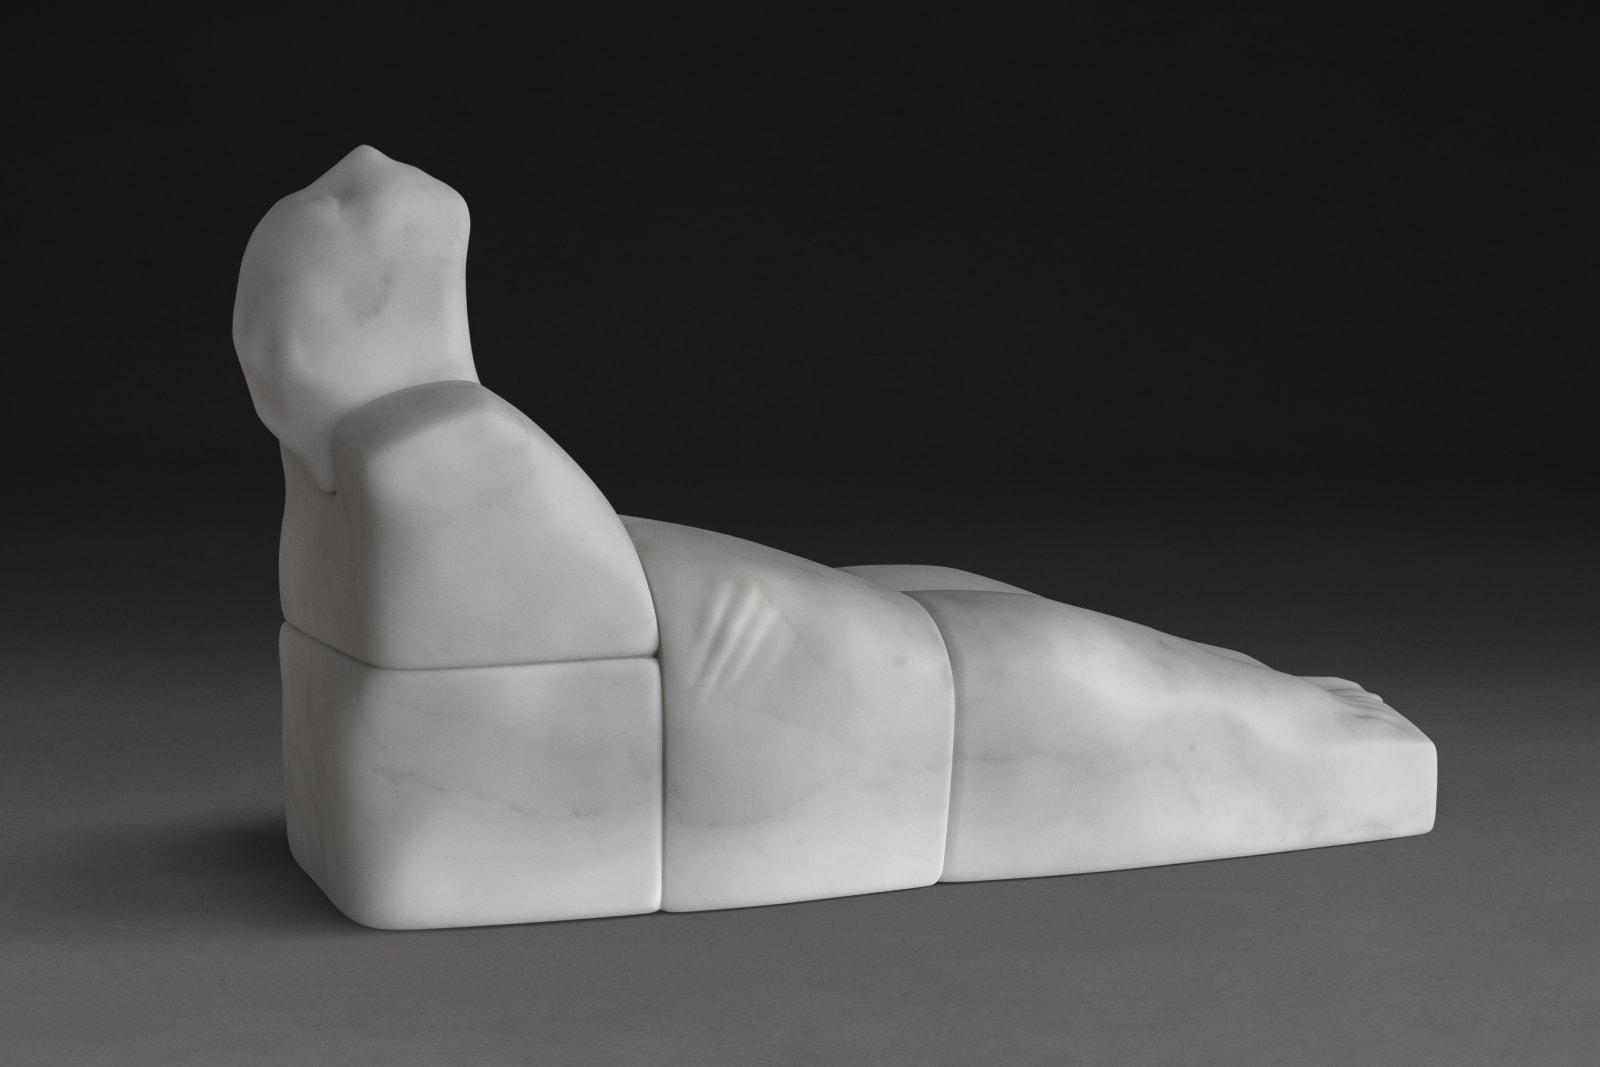 Before Sunrise, White Statuary - Marble of Carrara, 28 x 83 x 48 cm, 2017